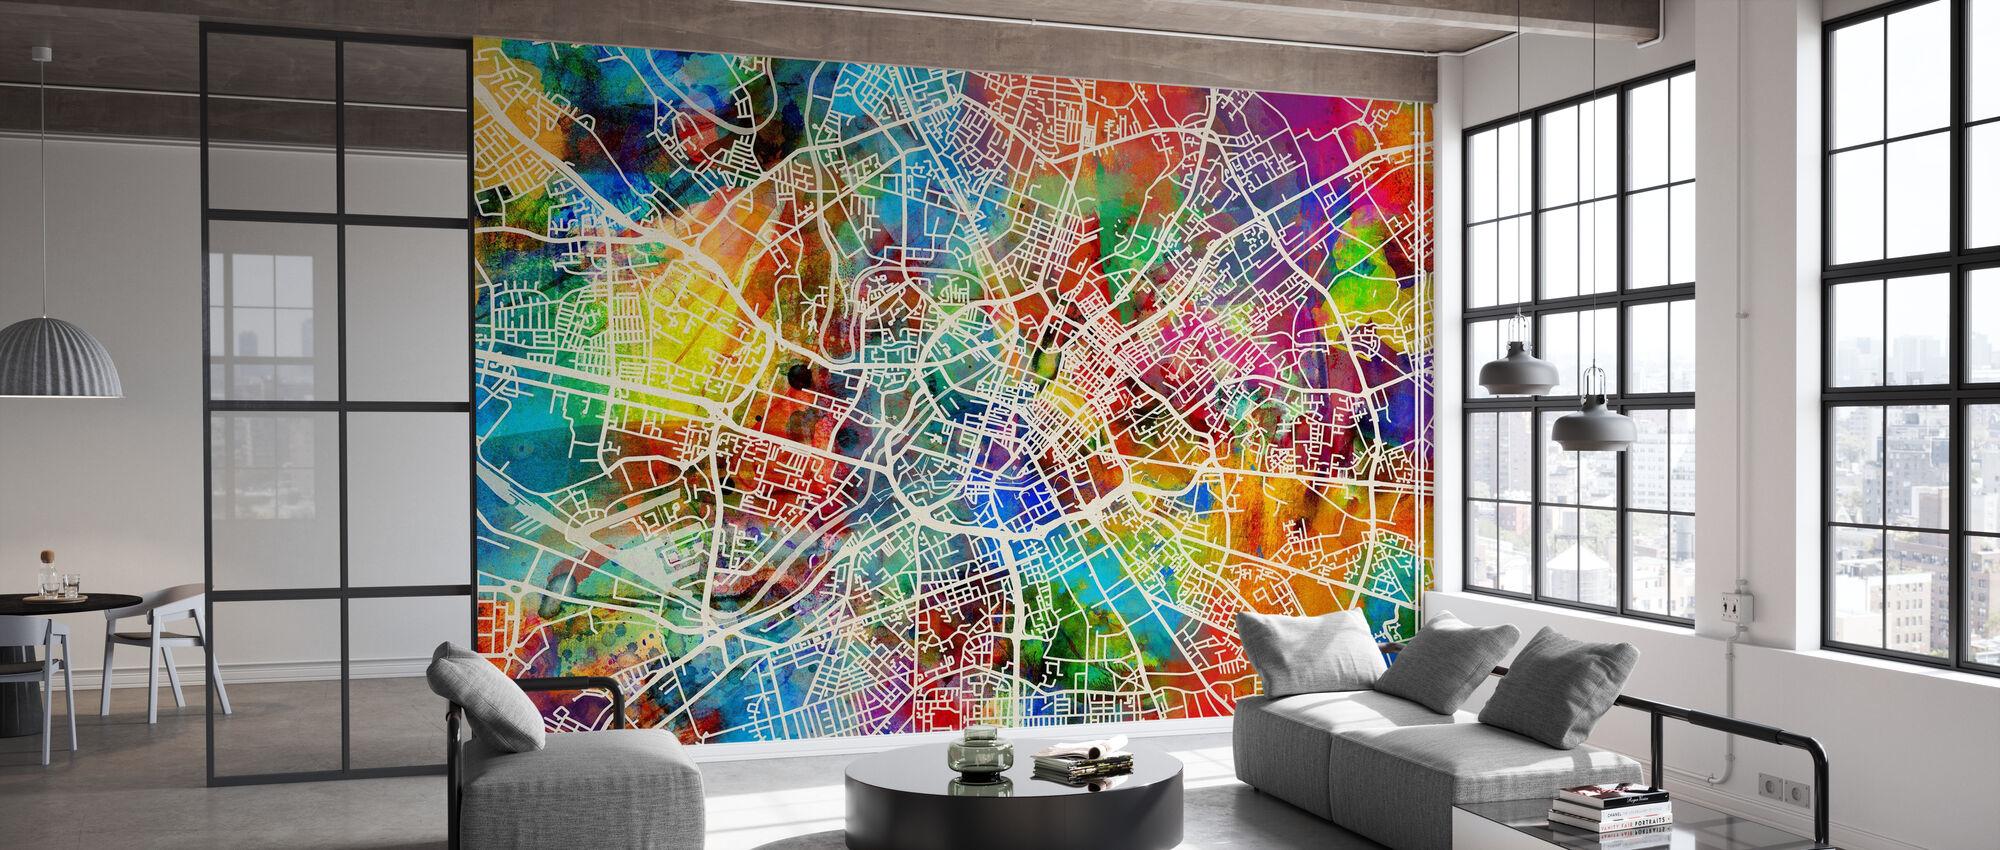 Manchester Street Map Mehrfarben - Tapete - Büro